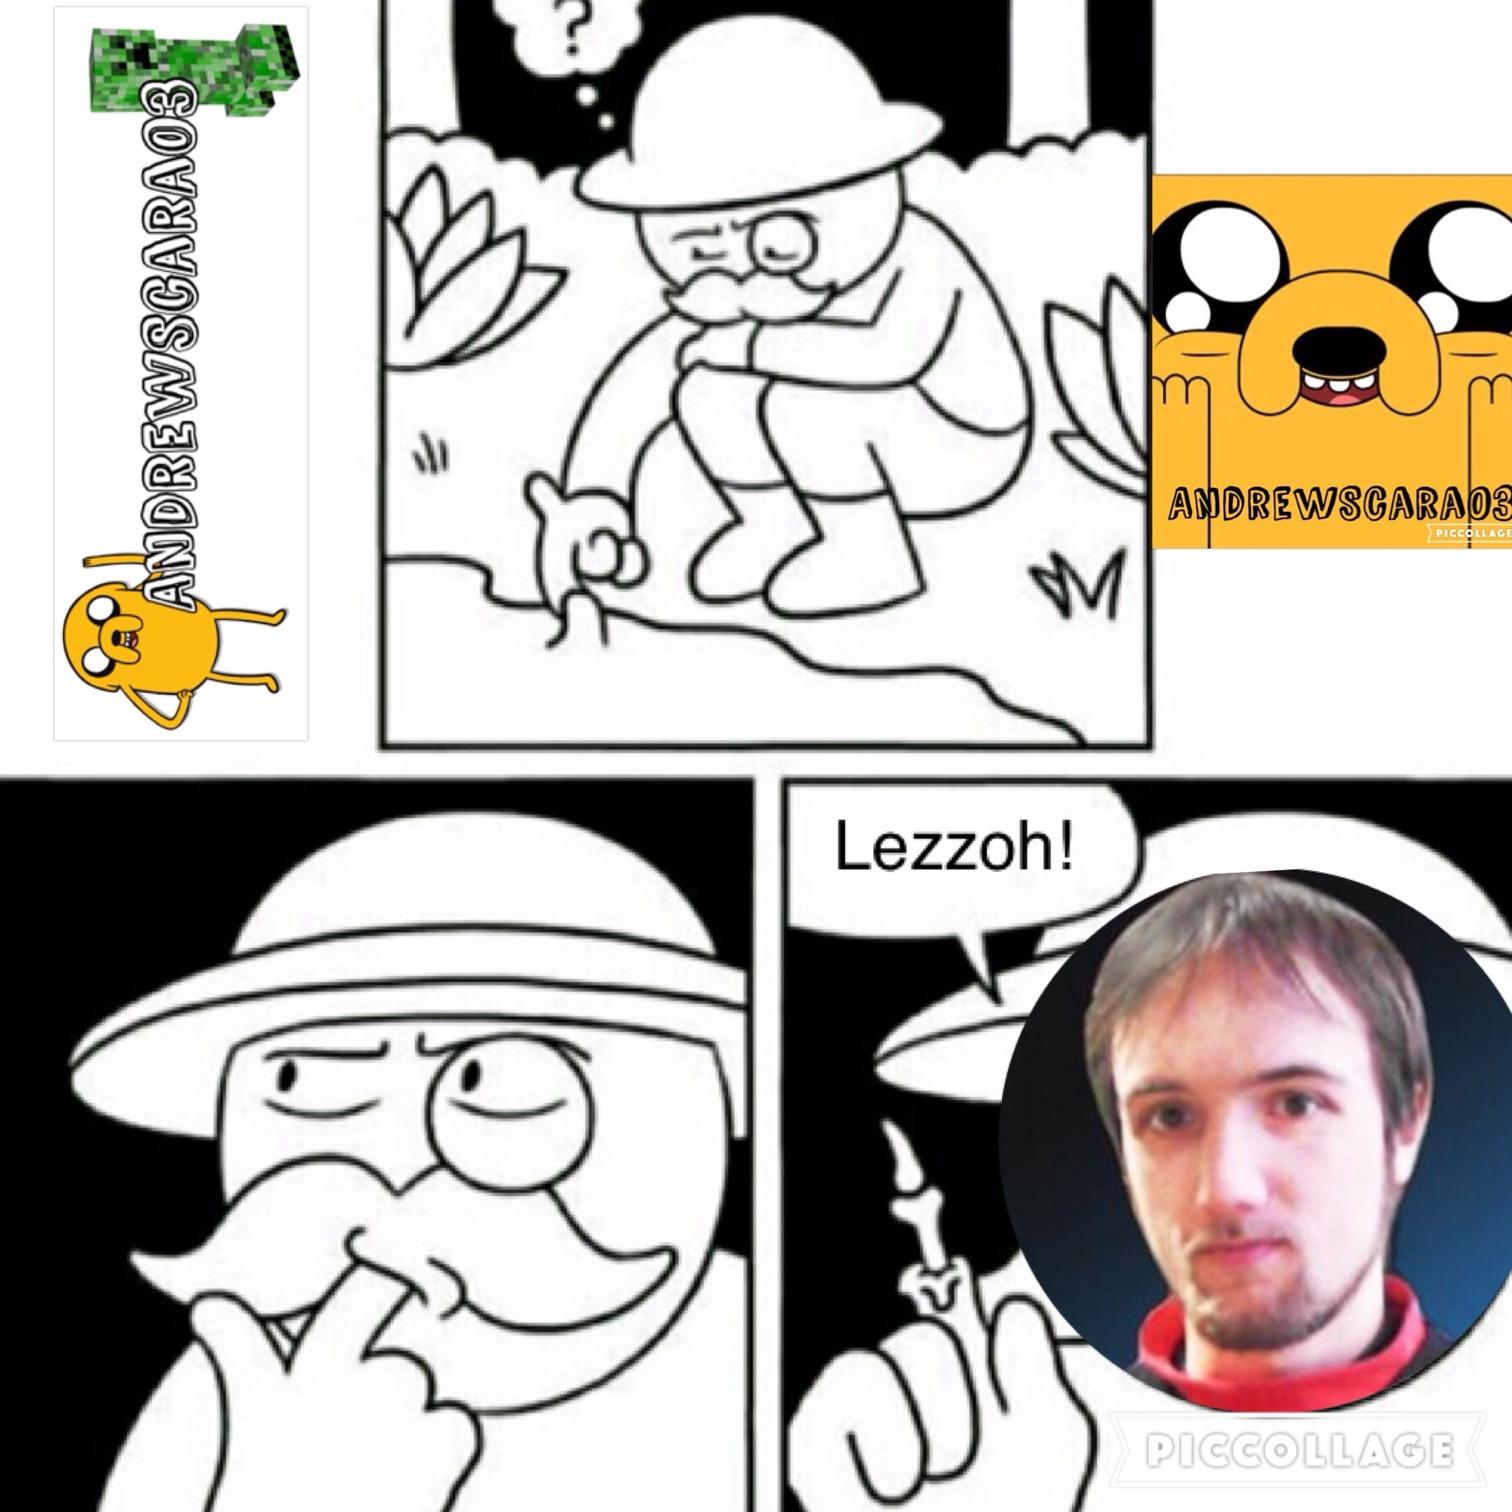 molto lezzoh - meme